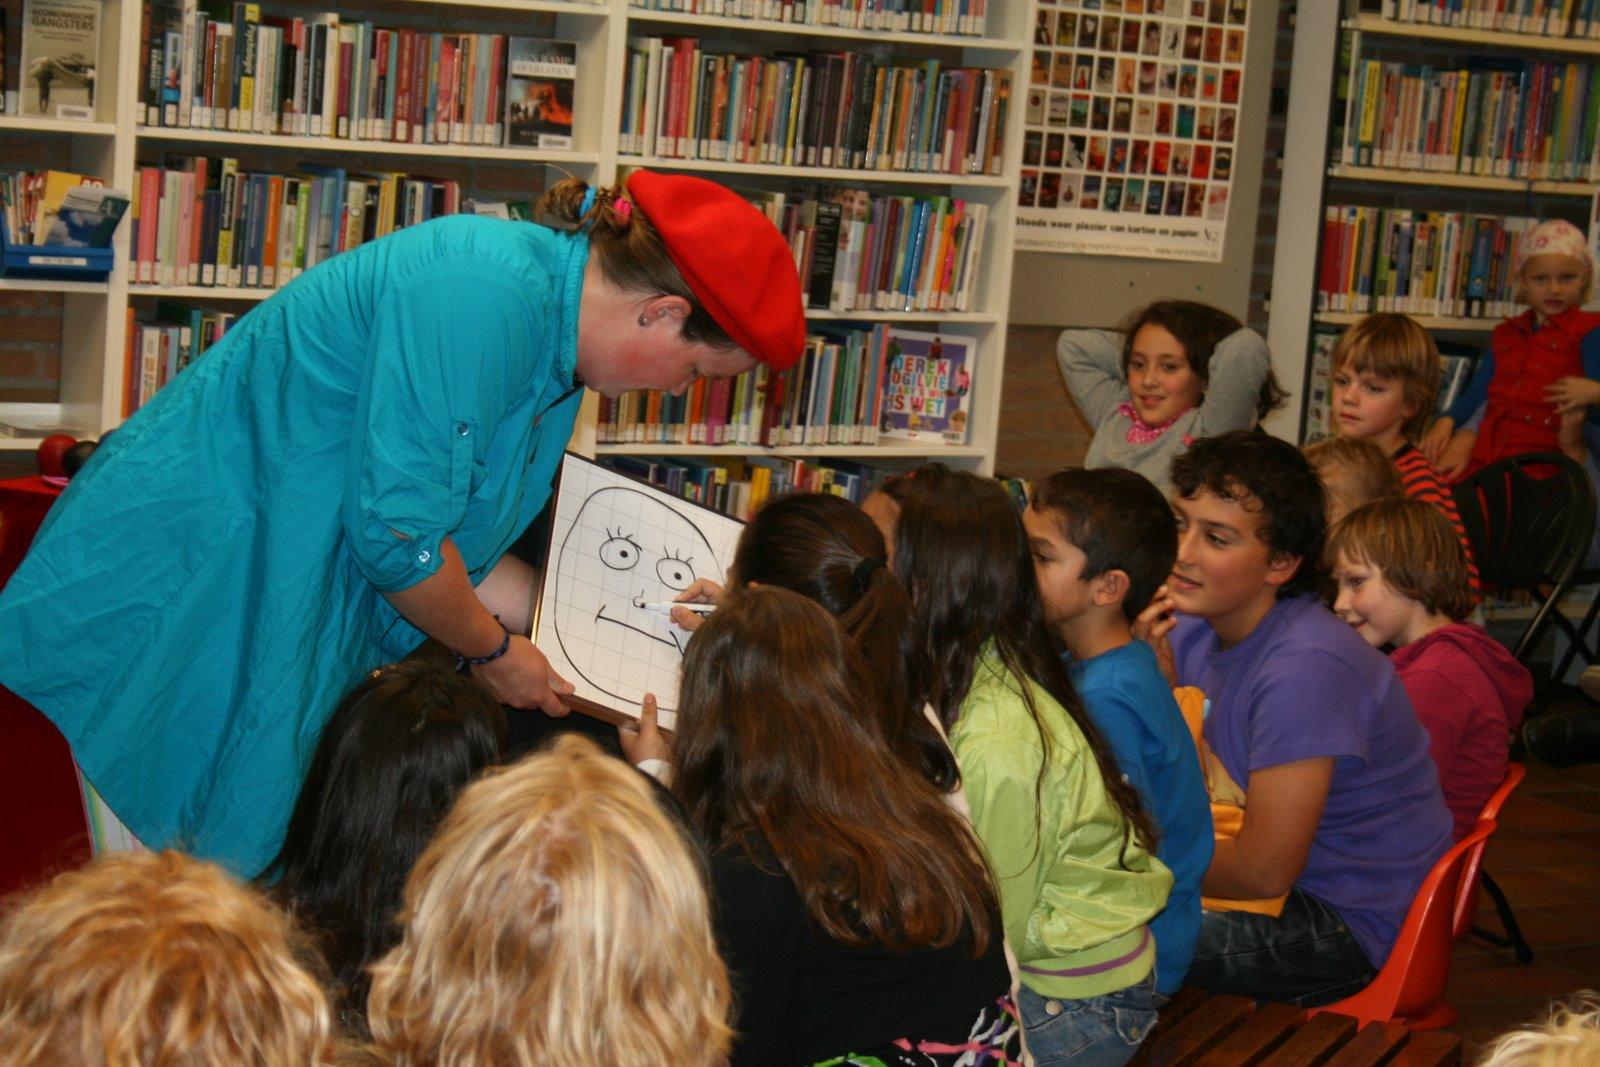 kindertheater kiko -kindervoorstelling Kikos tekenwedstrijd in de bibliotheek in Eerbeek